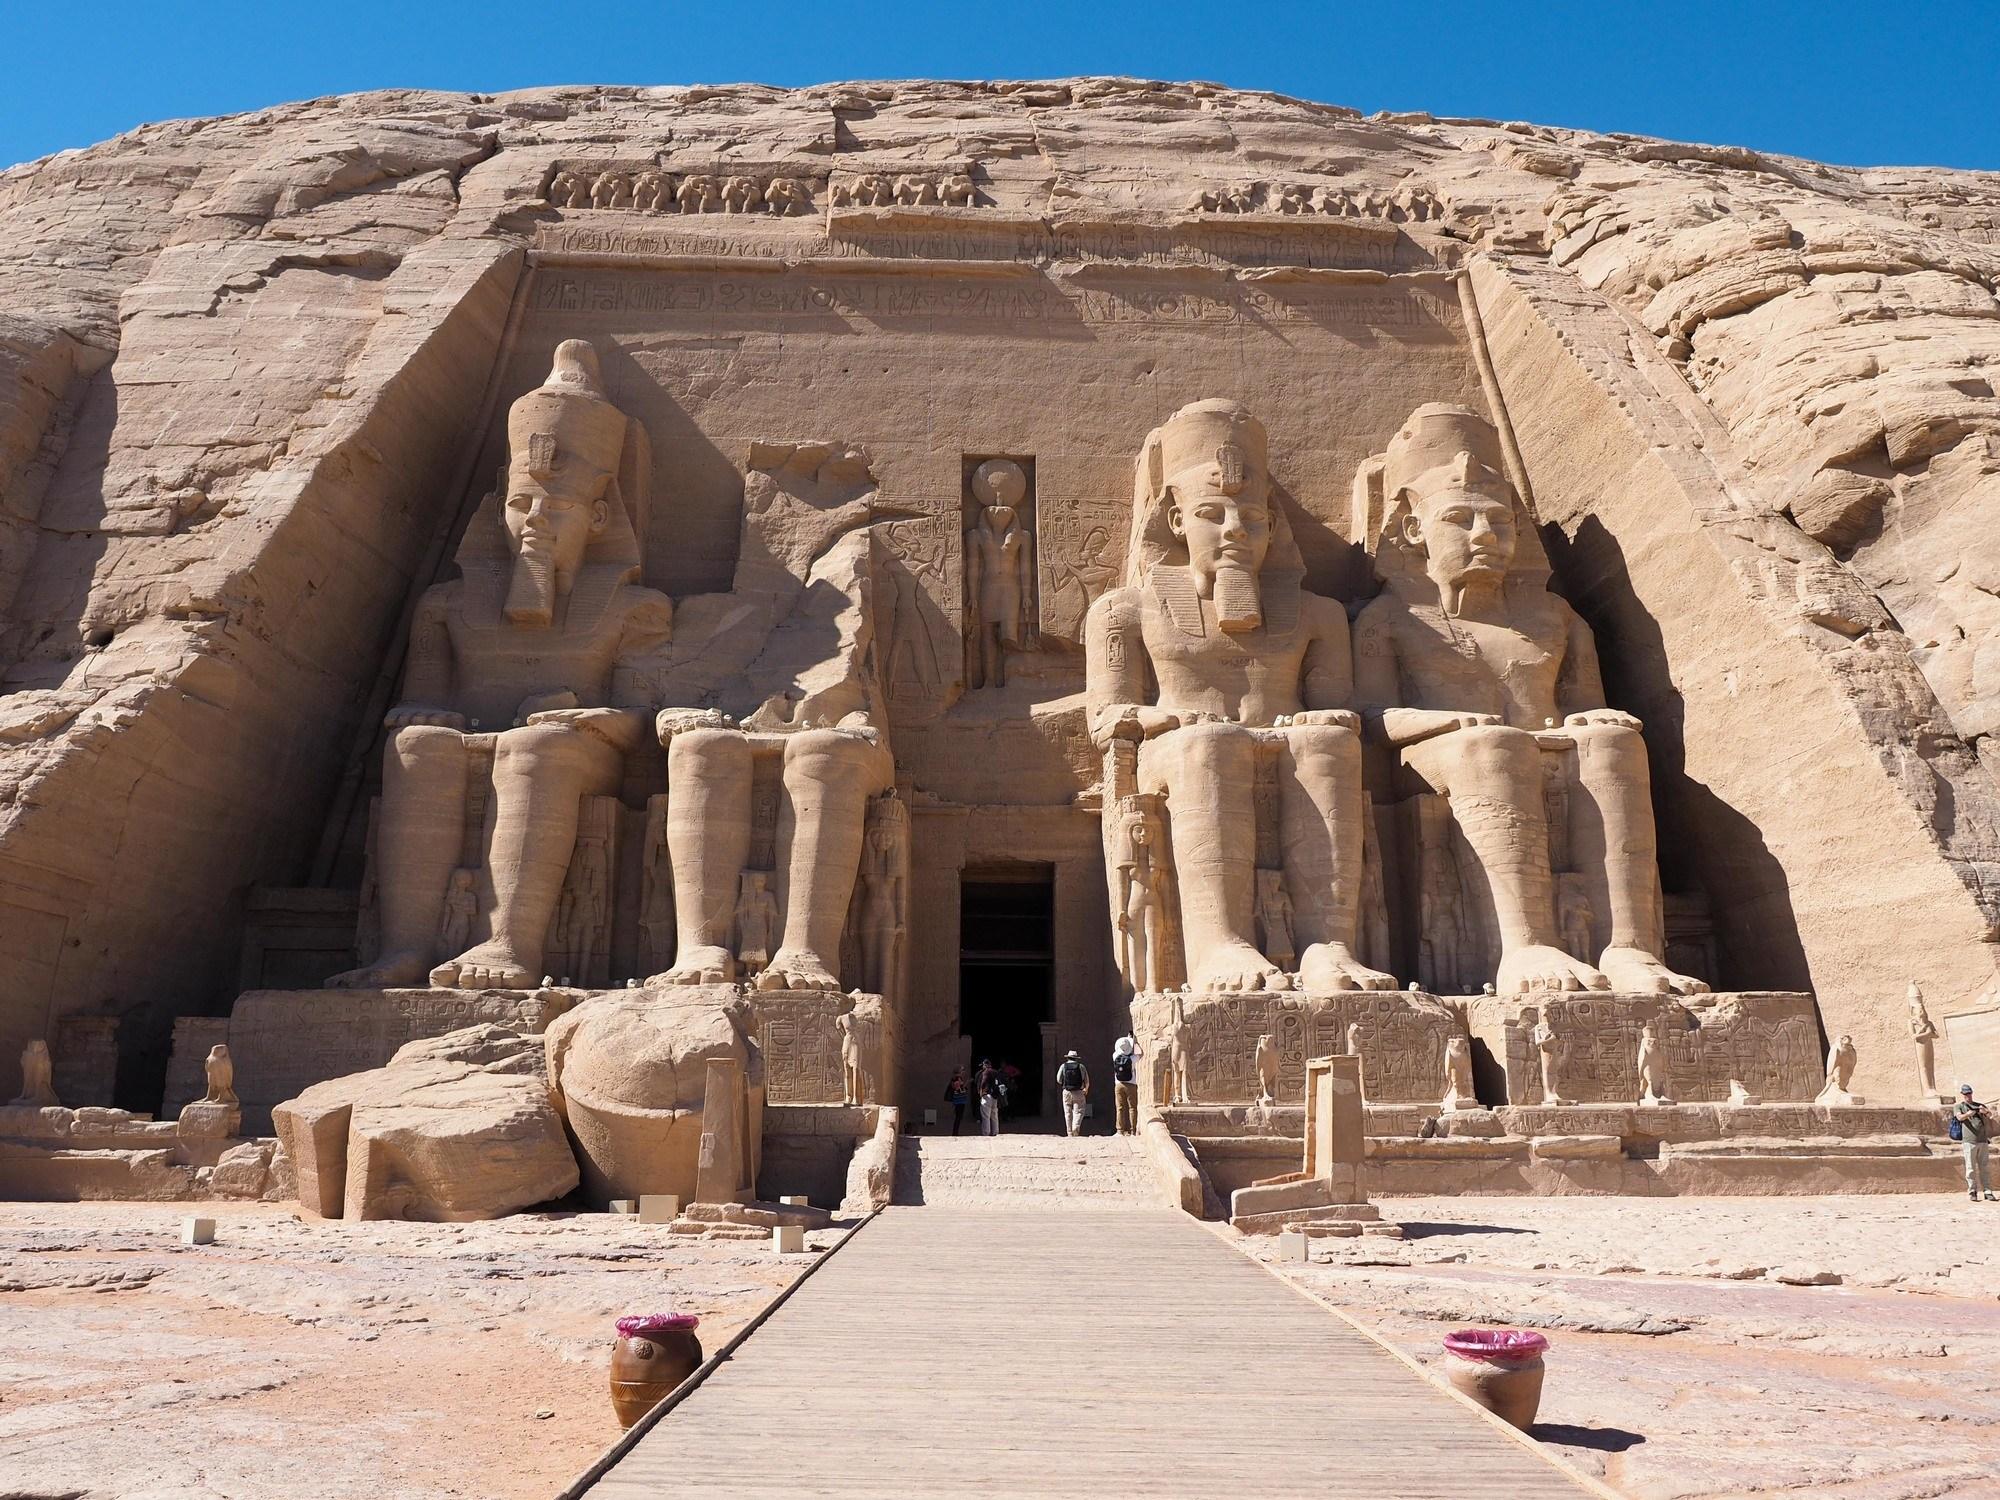 Abu Simbel temple in Egypt